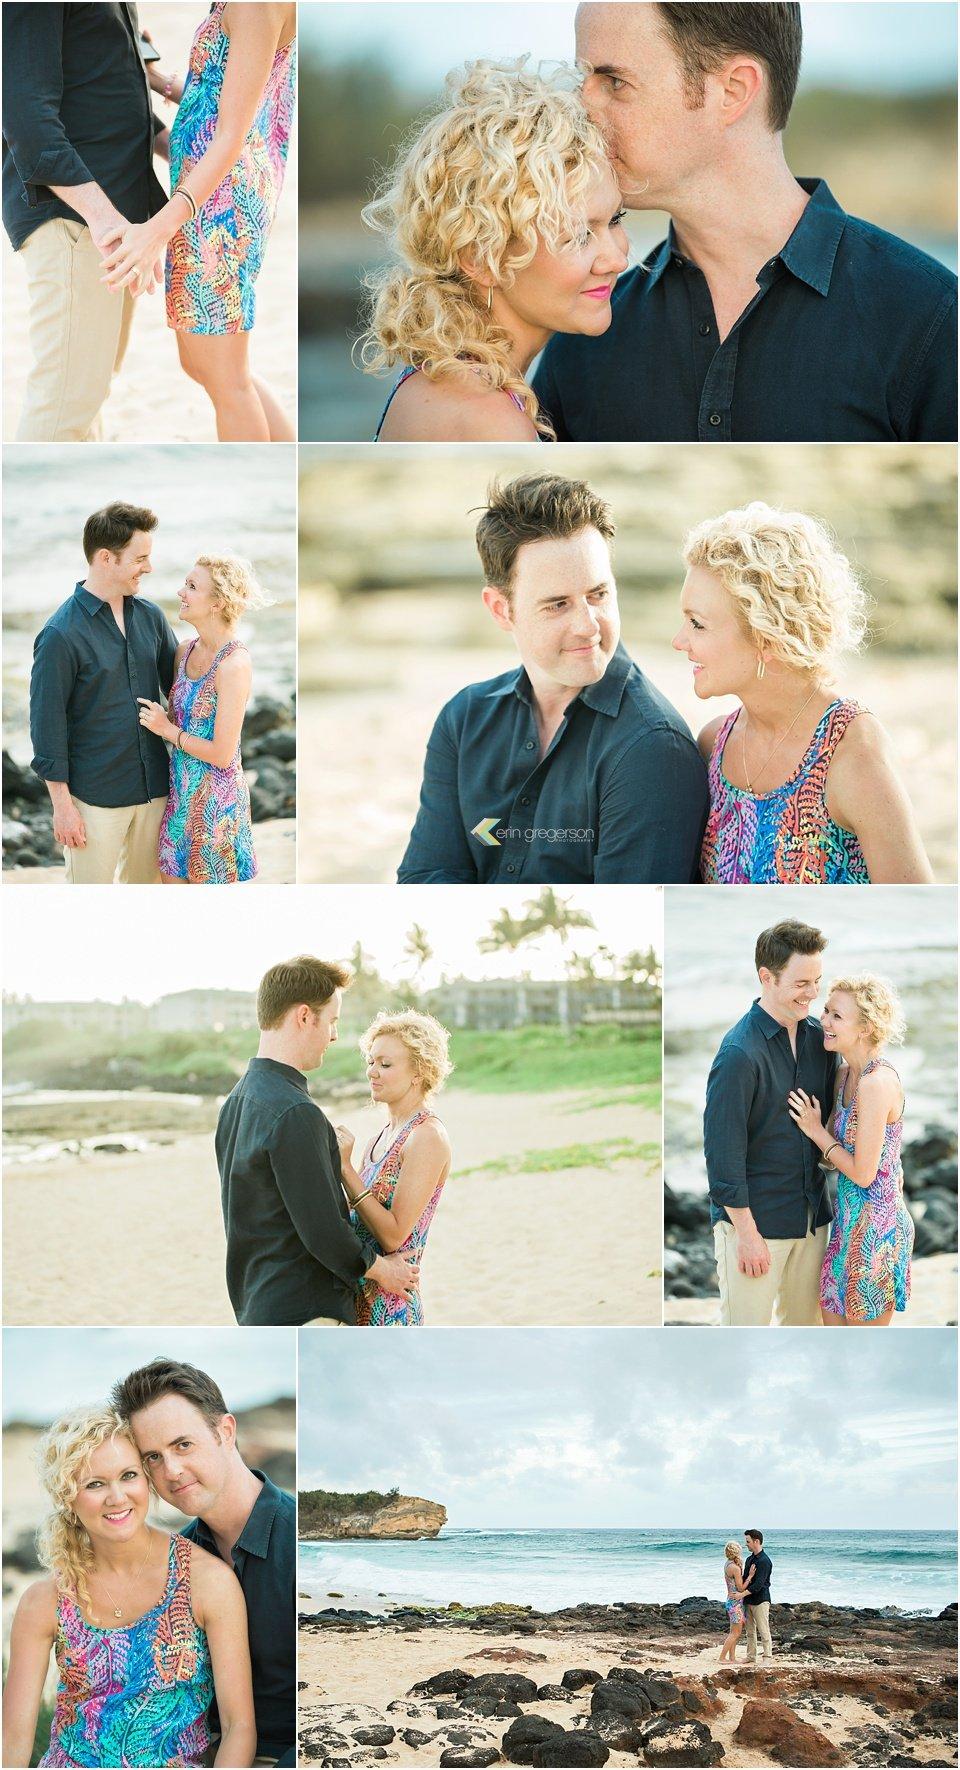 Kauai anniversary photography photos of couple on the beach by Erin Gregerson Photography